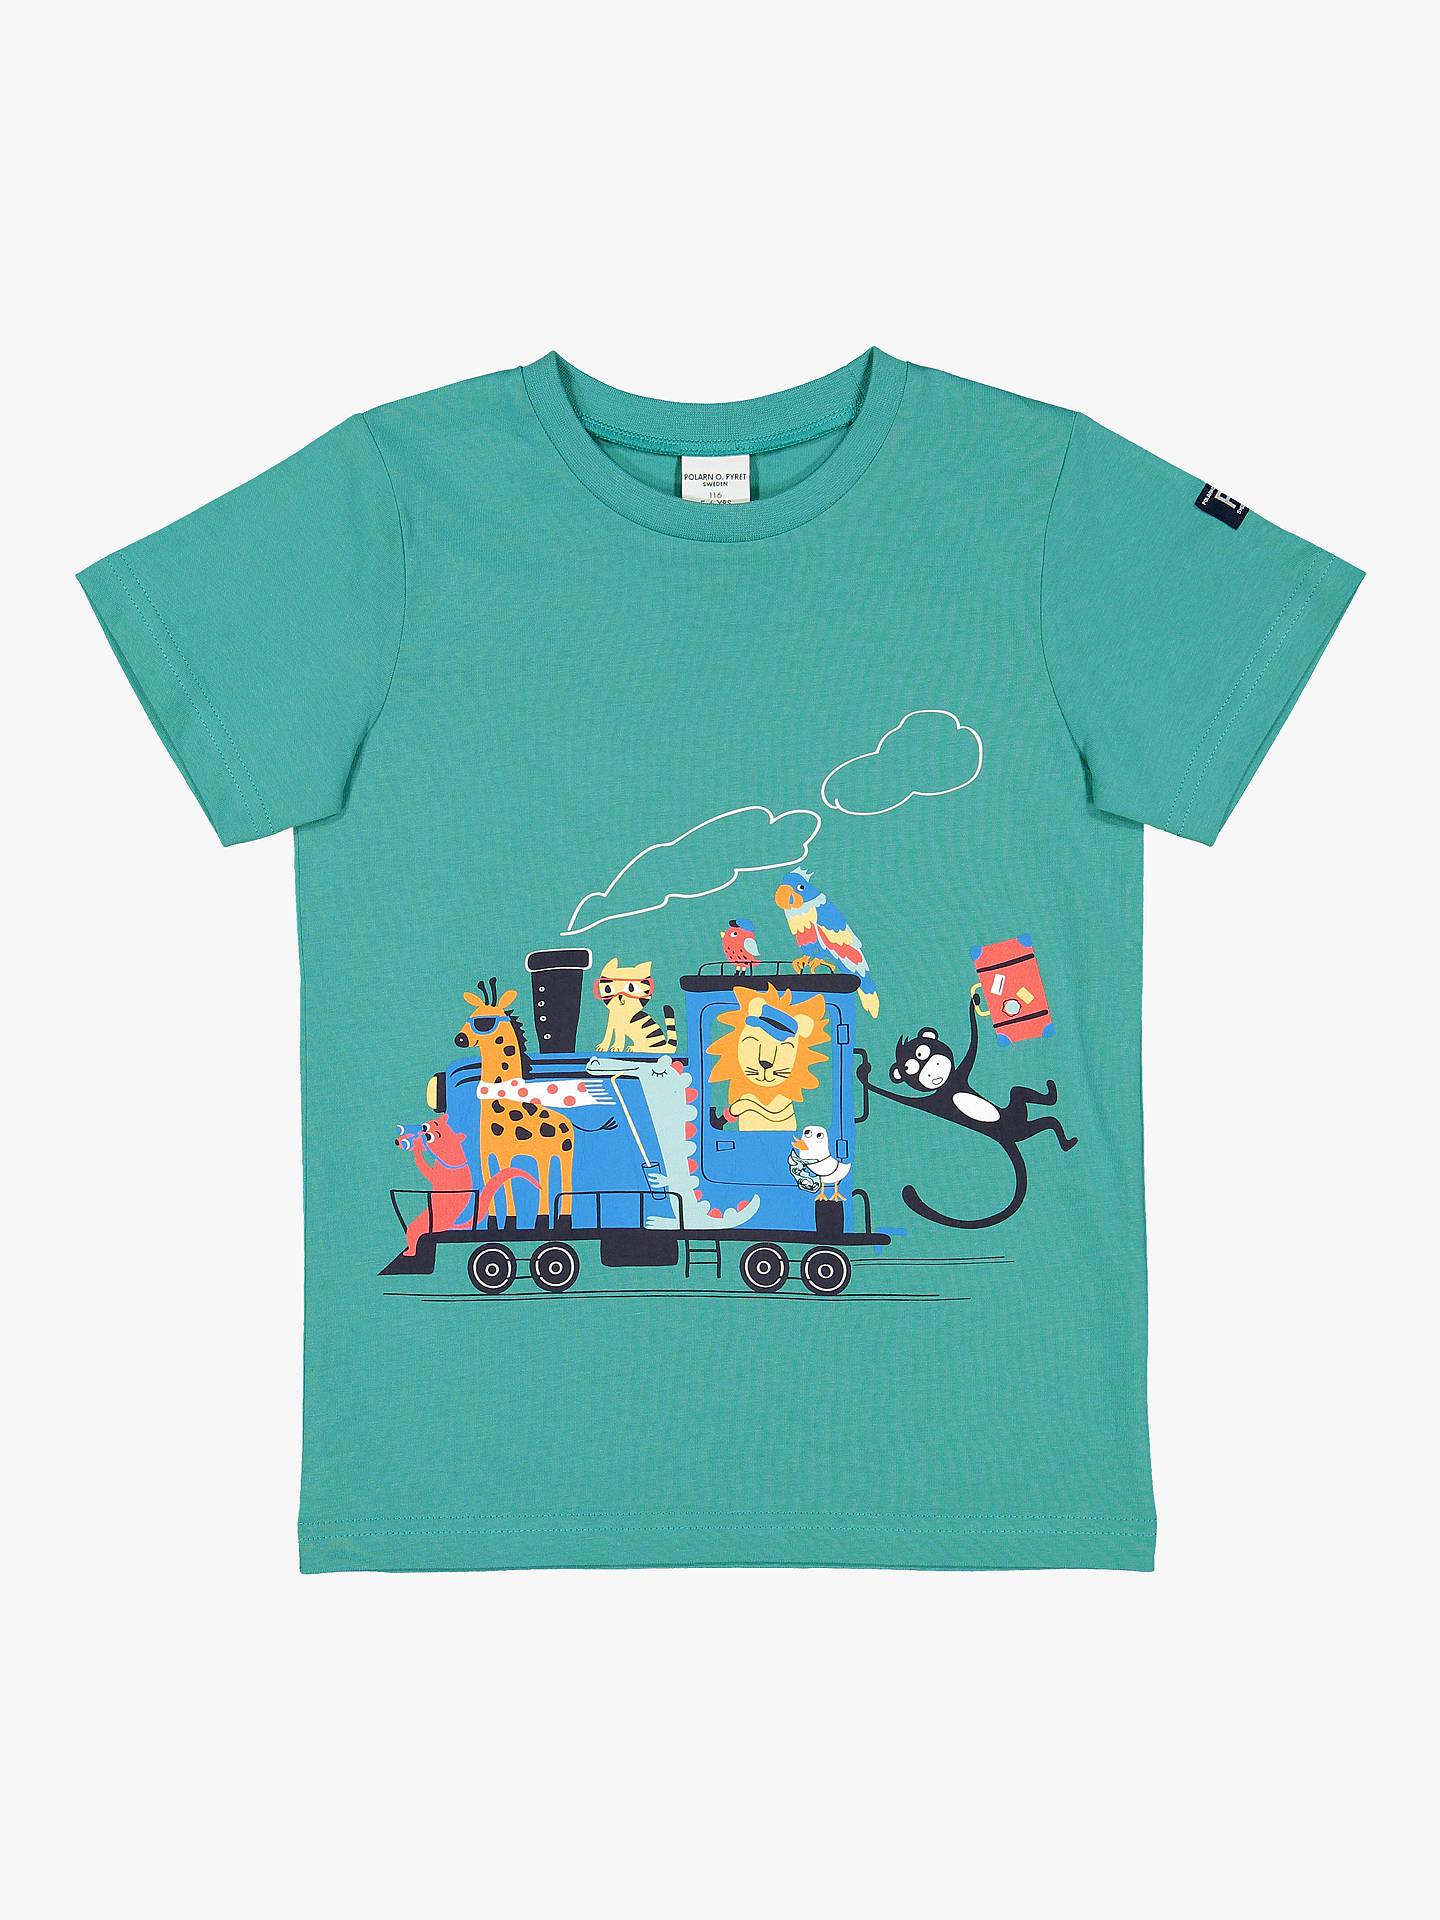 020d37e1 Buy Polarn O. Pyret Children's Vacay Graphic T-Shirt, Green, 12- ...